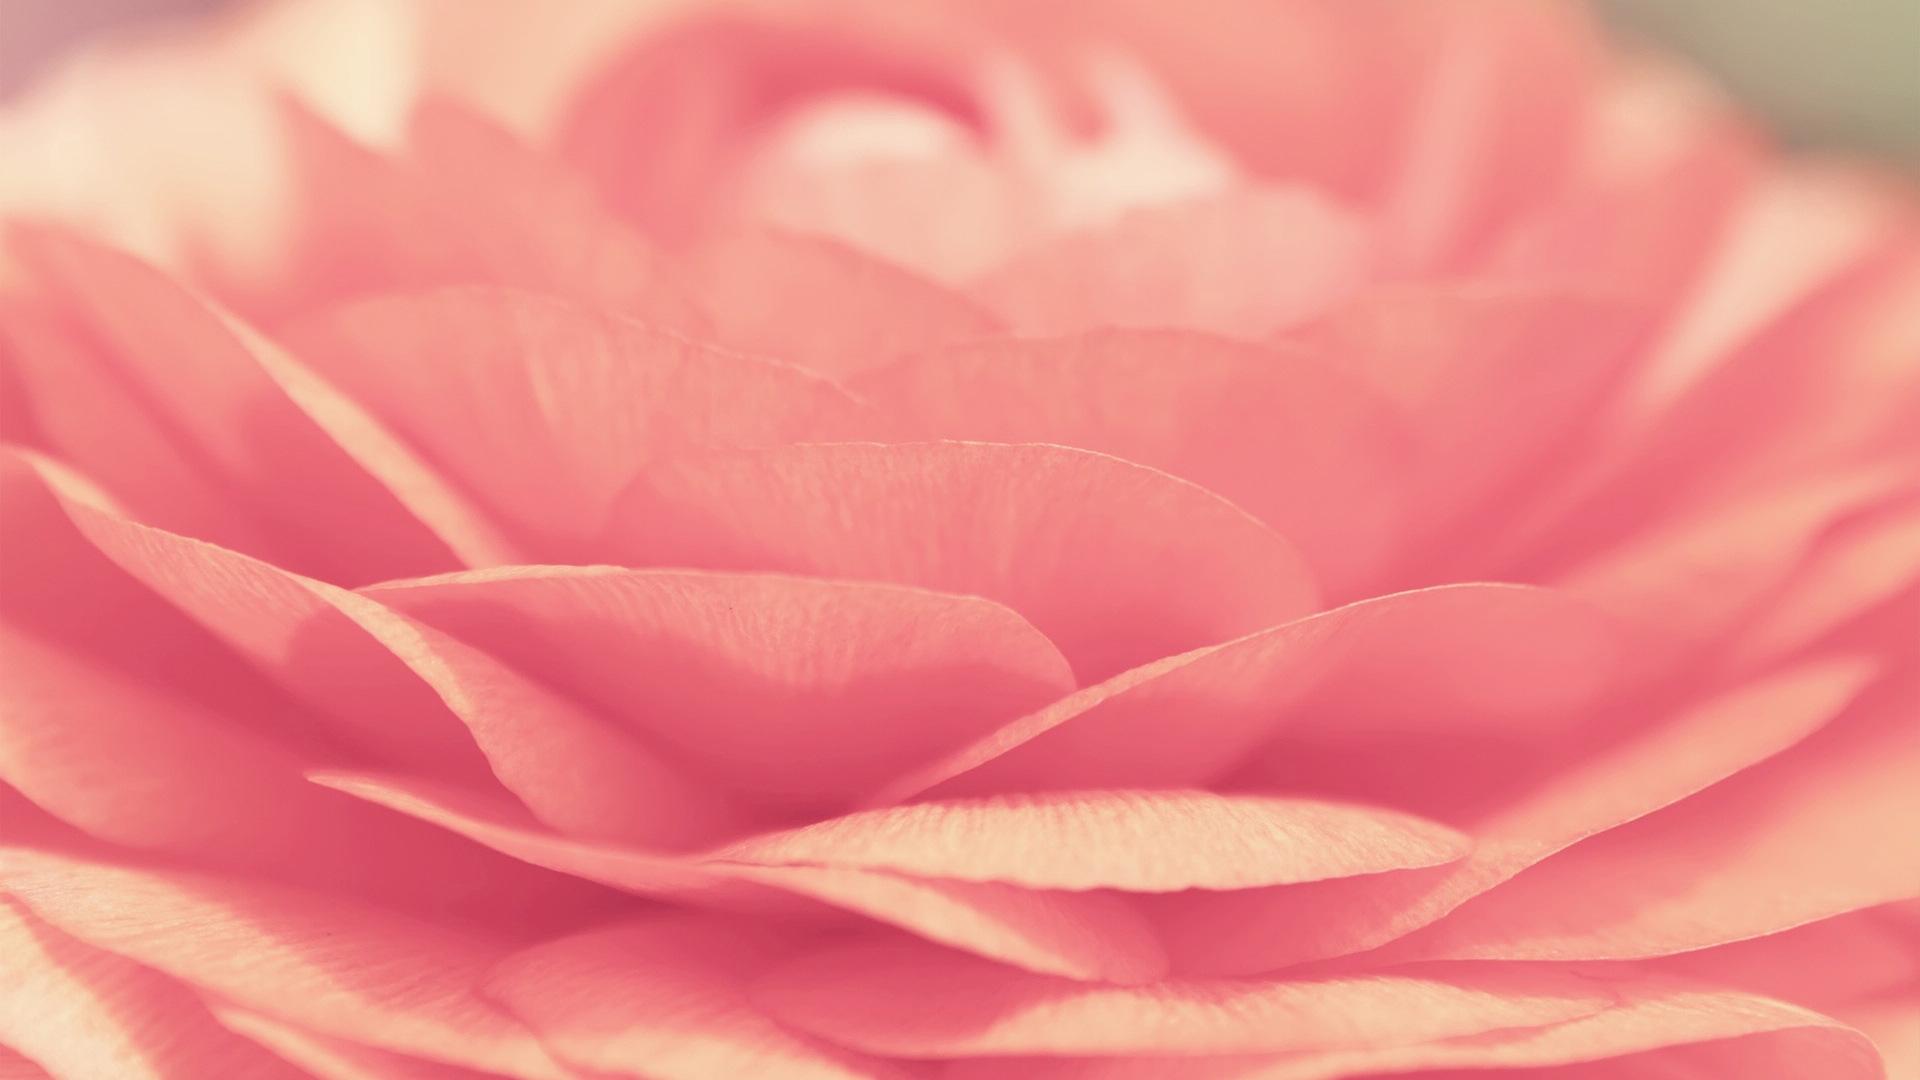 pink wallpapers rose wallpaper desktop 1920x1080 1920x1080